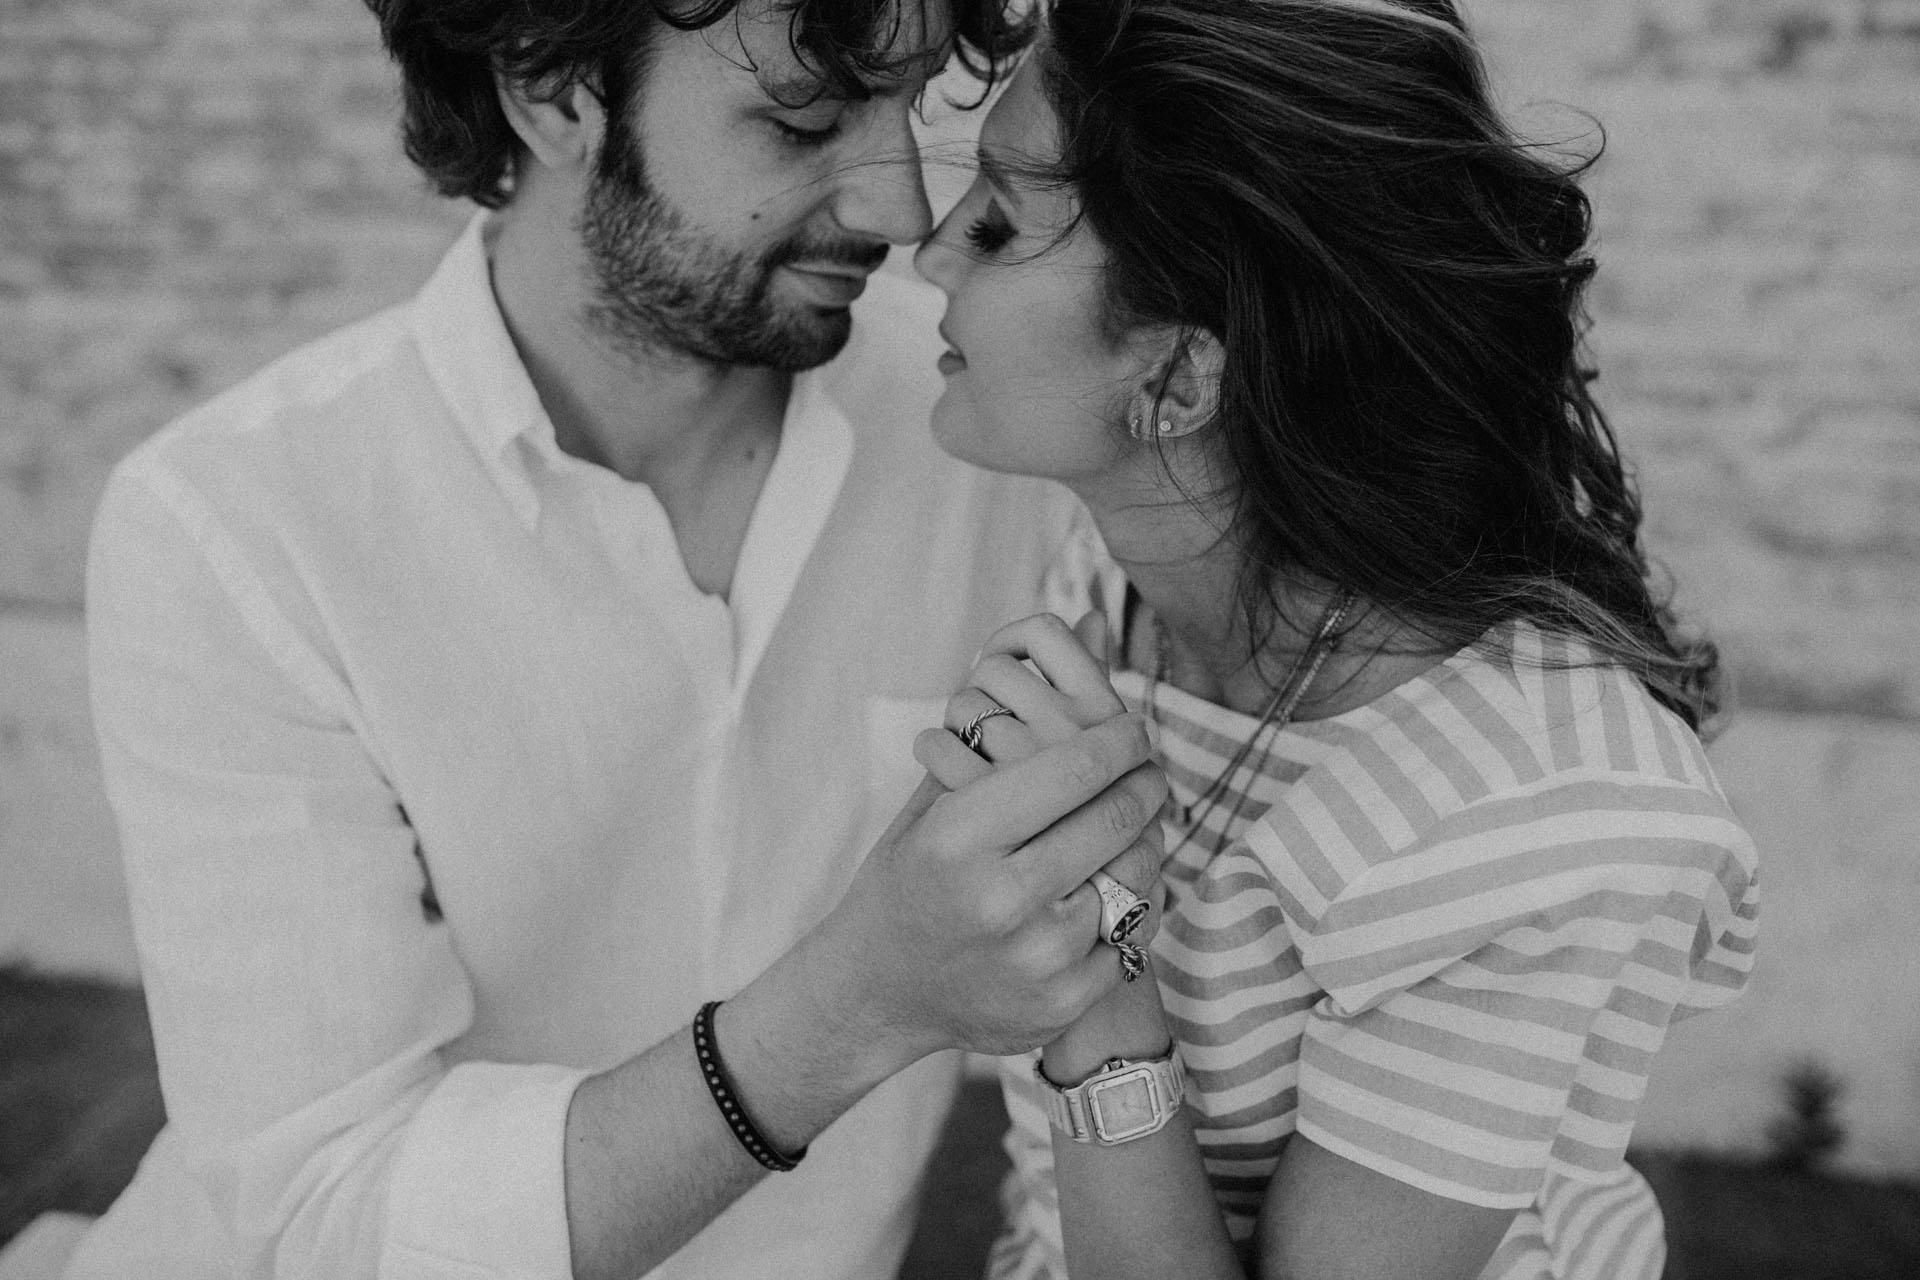 coupleshooting-roma-hochzeitsfotografen-wien-agnesundandi-22